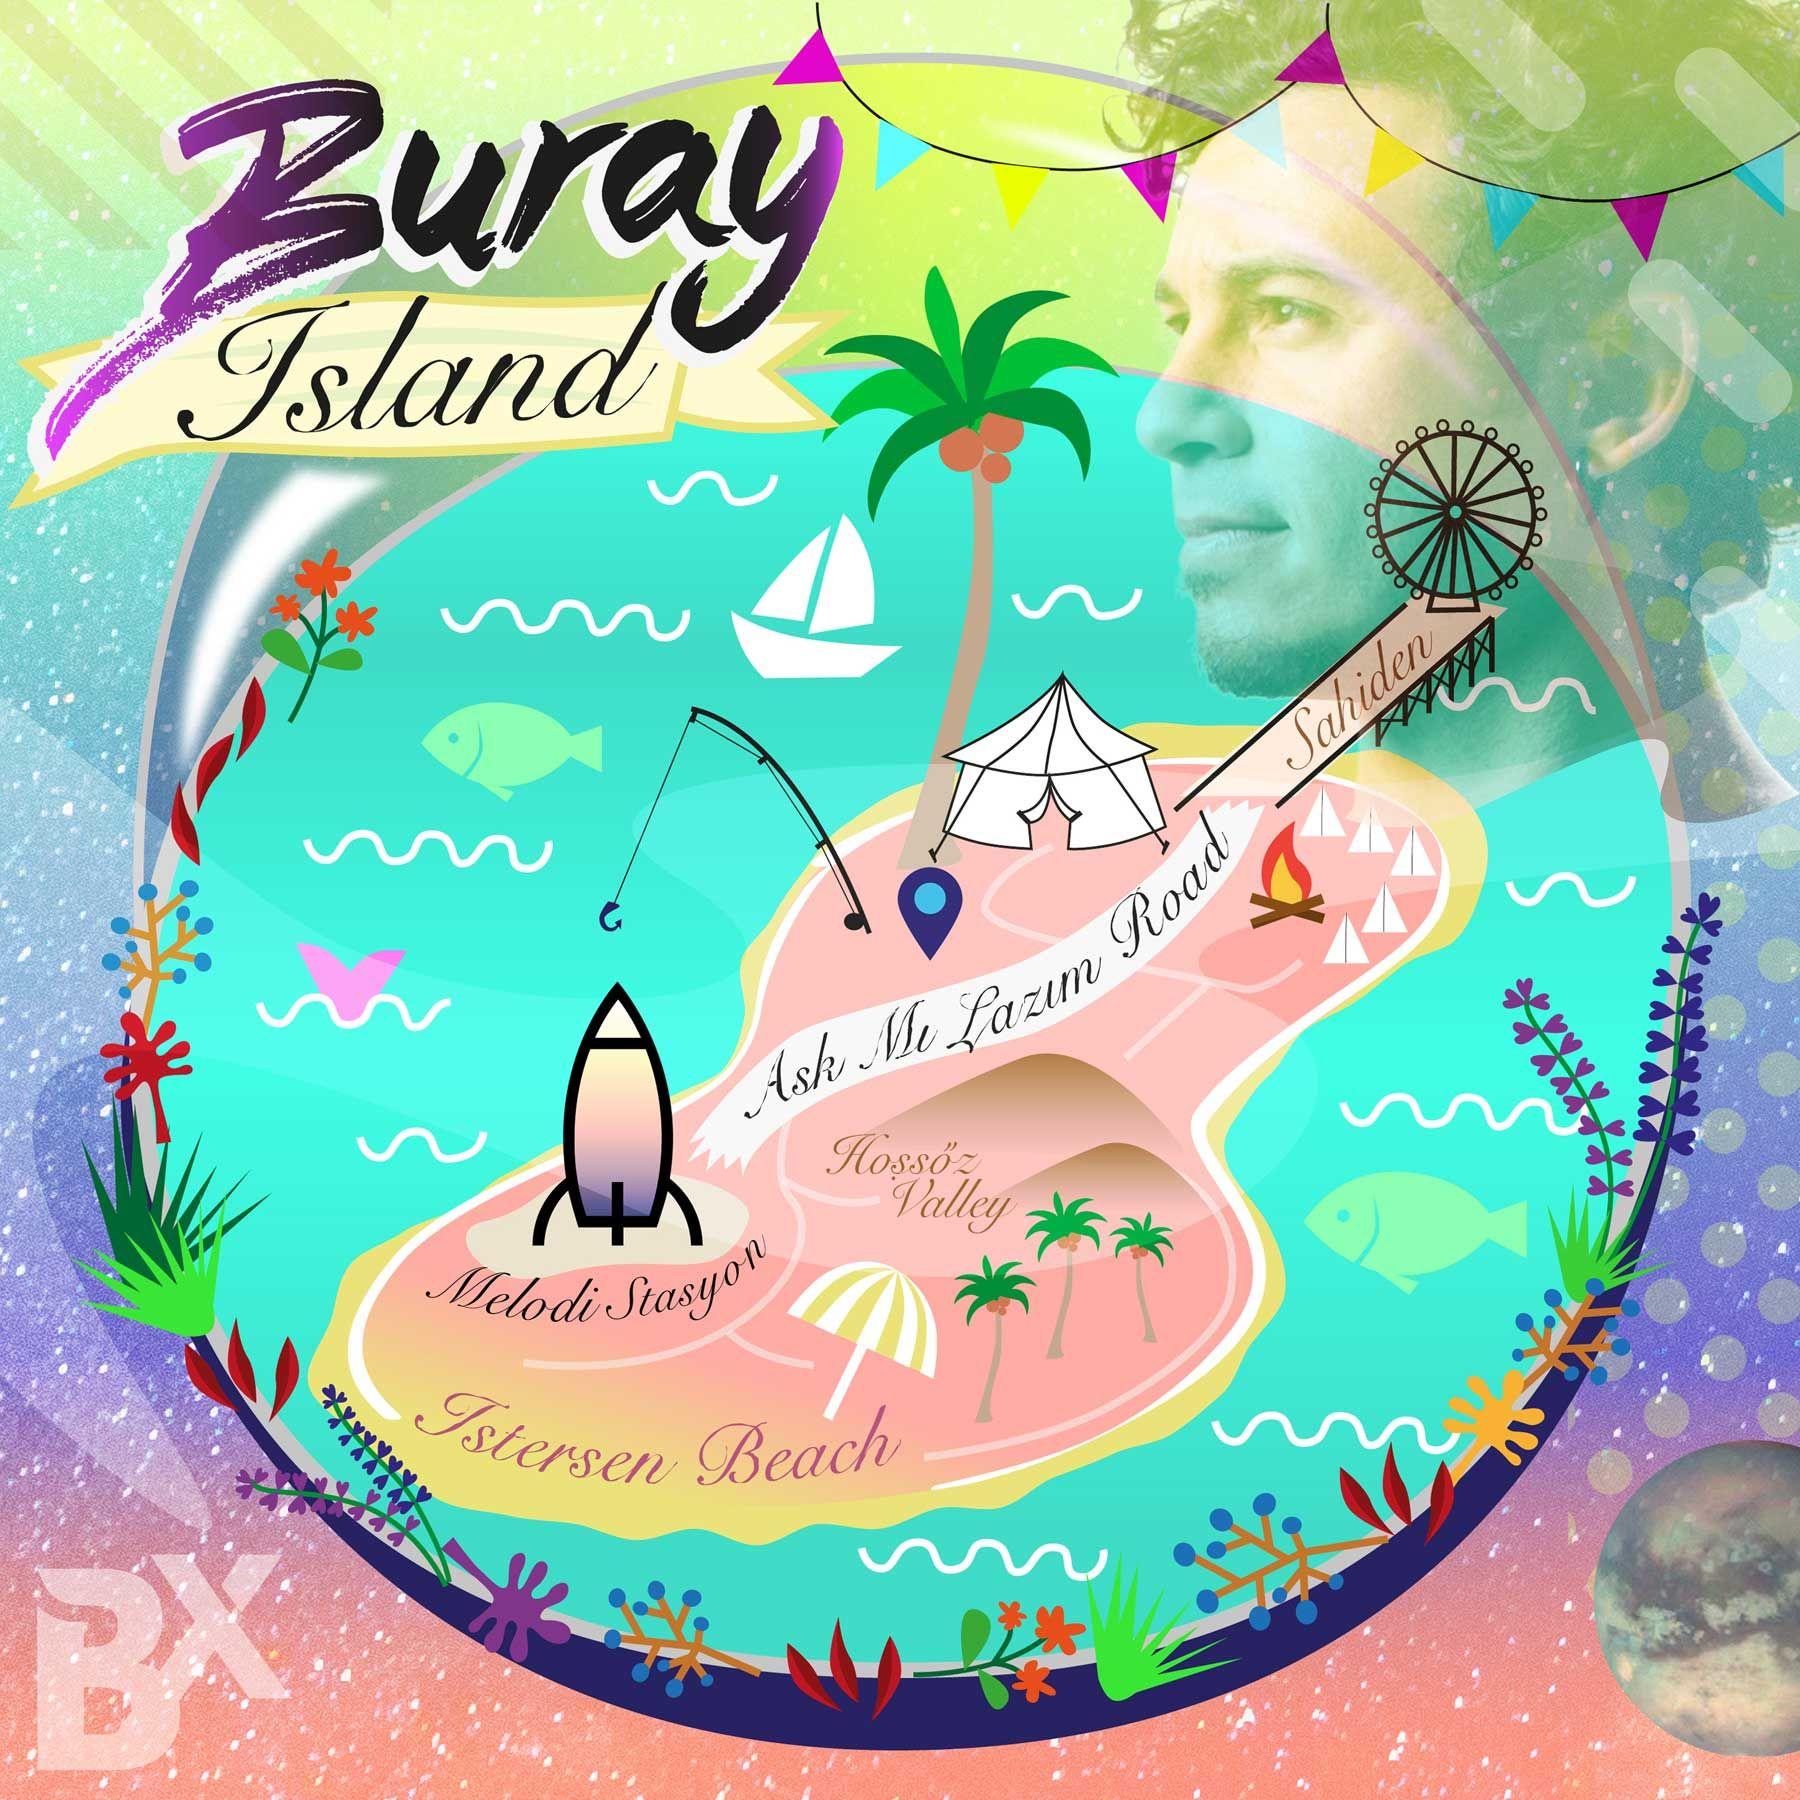 Art By Yoljoo Buray Island Visual Design Artwork Creative